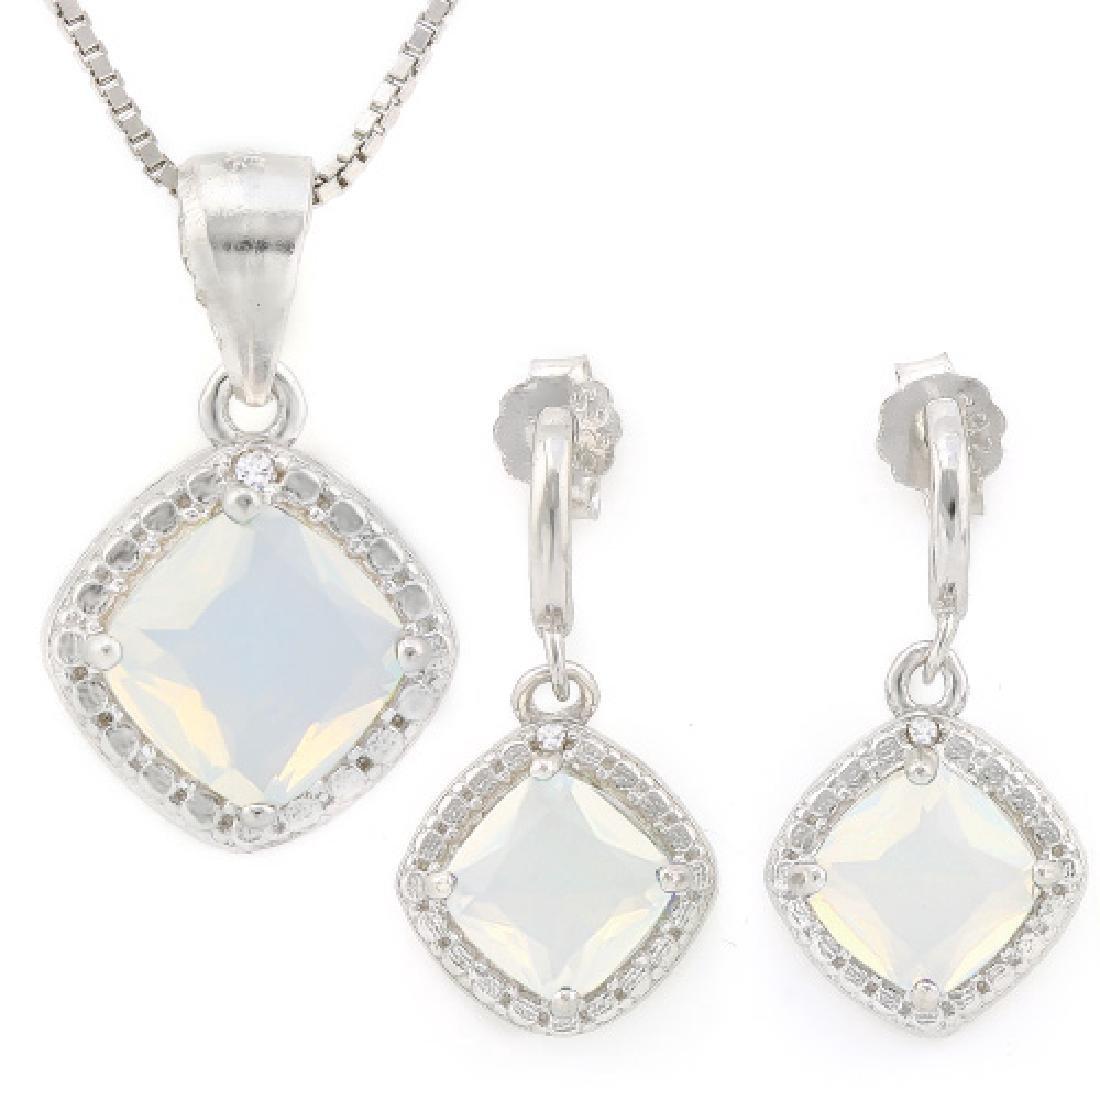 2 4/5 CARAT CREATED FIRE OPALS & GENUINE DIAMONDS 925 S